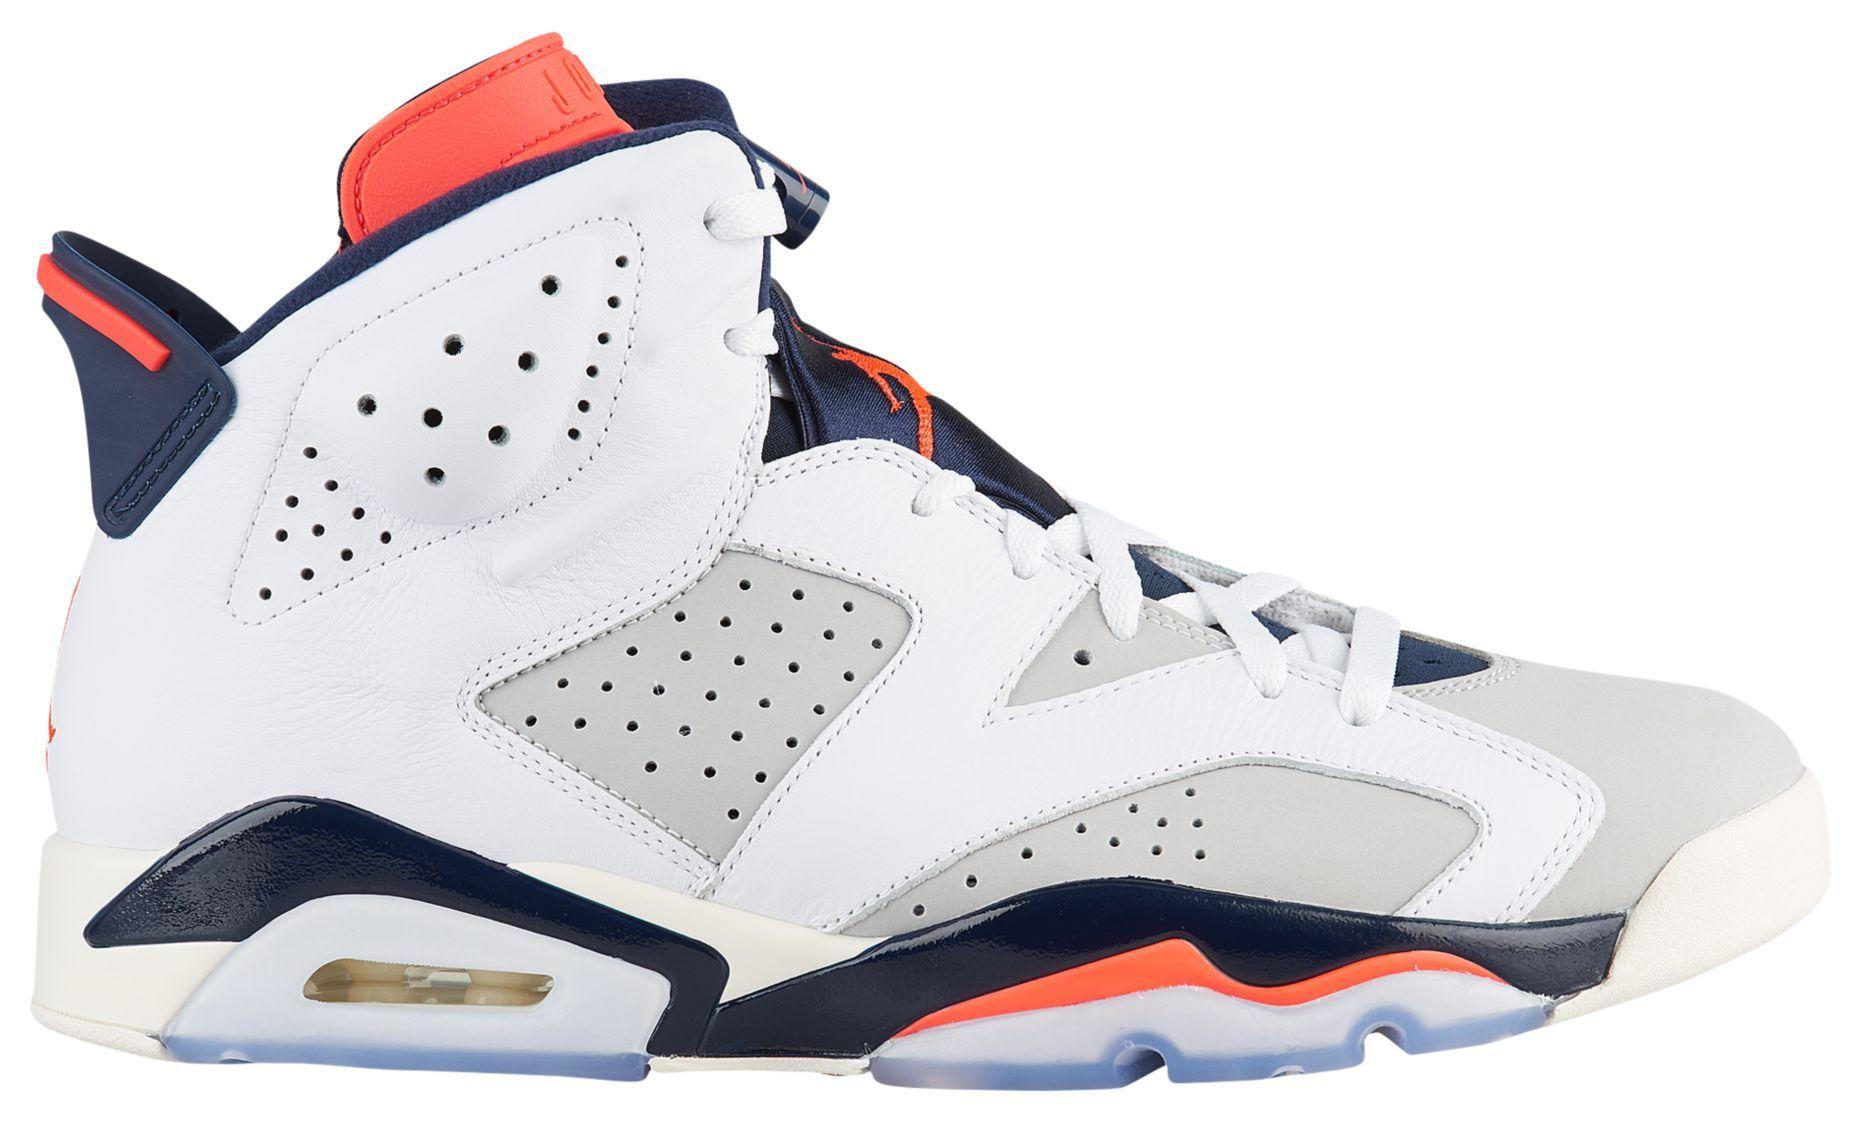 616e99858da Are You Waiting For The Air Jordan 6 Tinker? | Air Jordans | Jordans ...